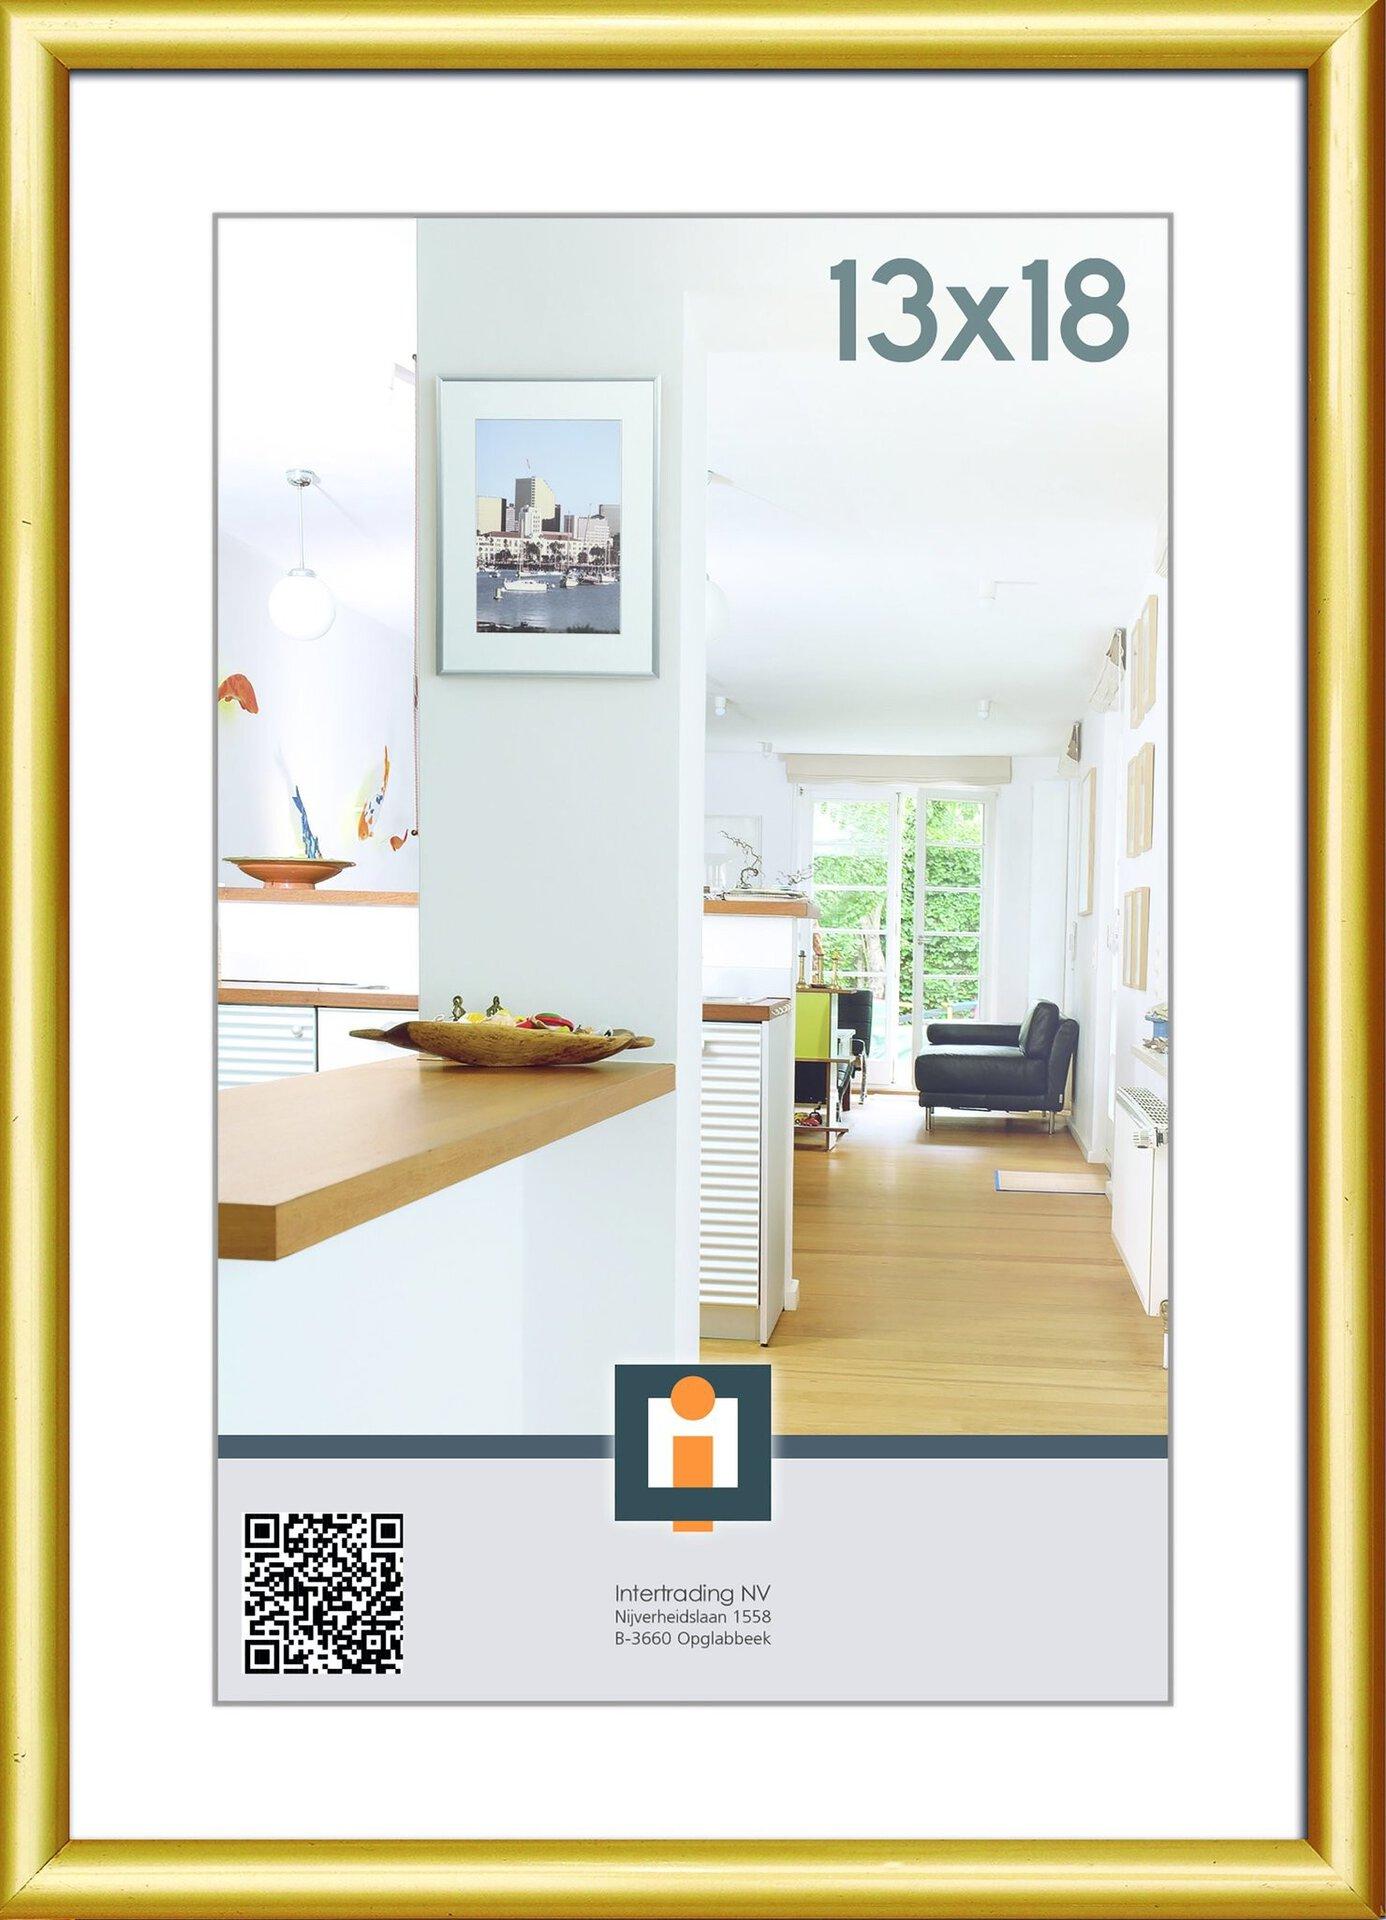 Bilderrahmen KIEL INTERTRADING Kunststoff 14 x 19 x 1 cm